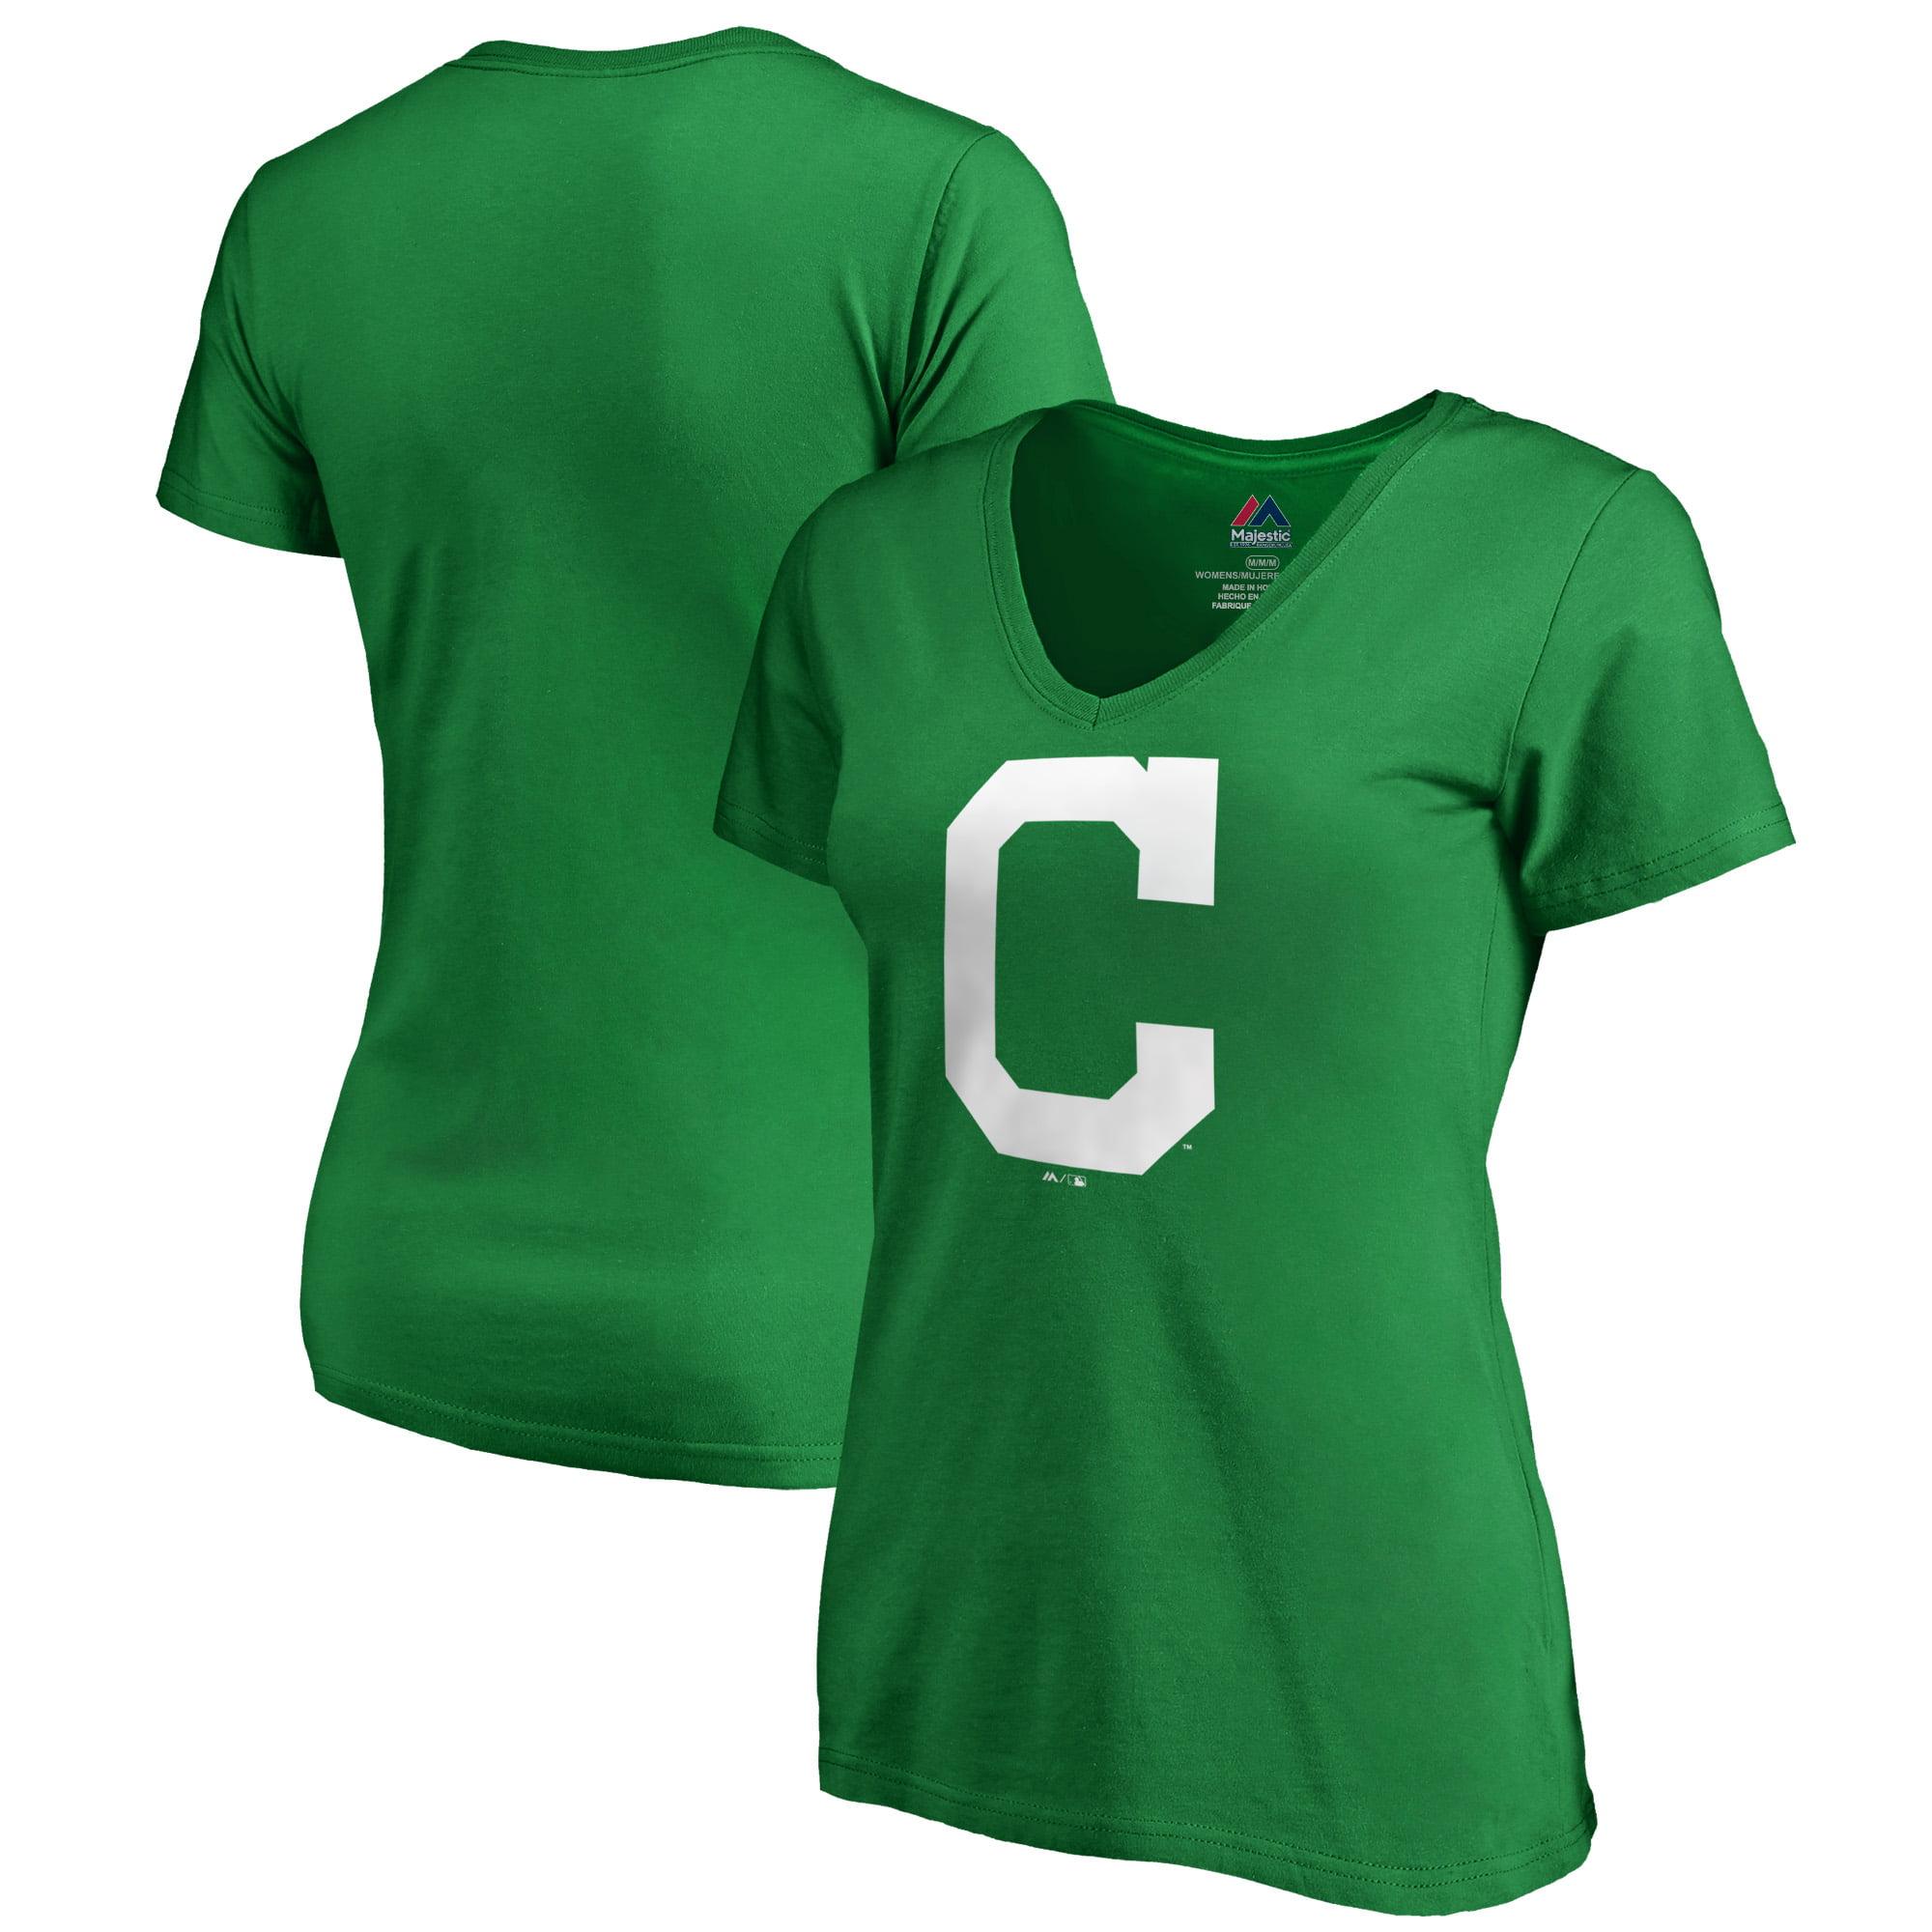 Cleveland Indians Majestic Women's St. Patrick's Day White Logo V-Neck T-Shirt - Kelly Green